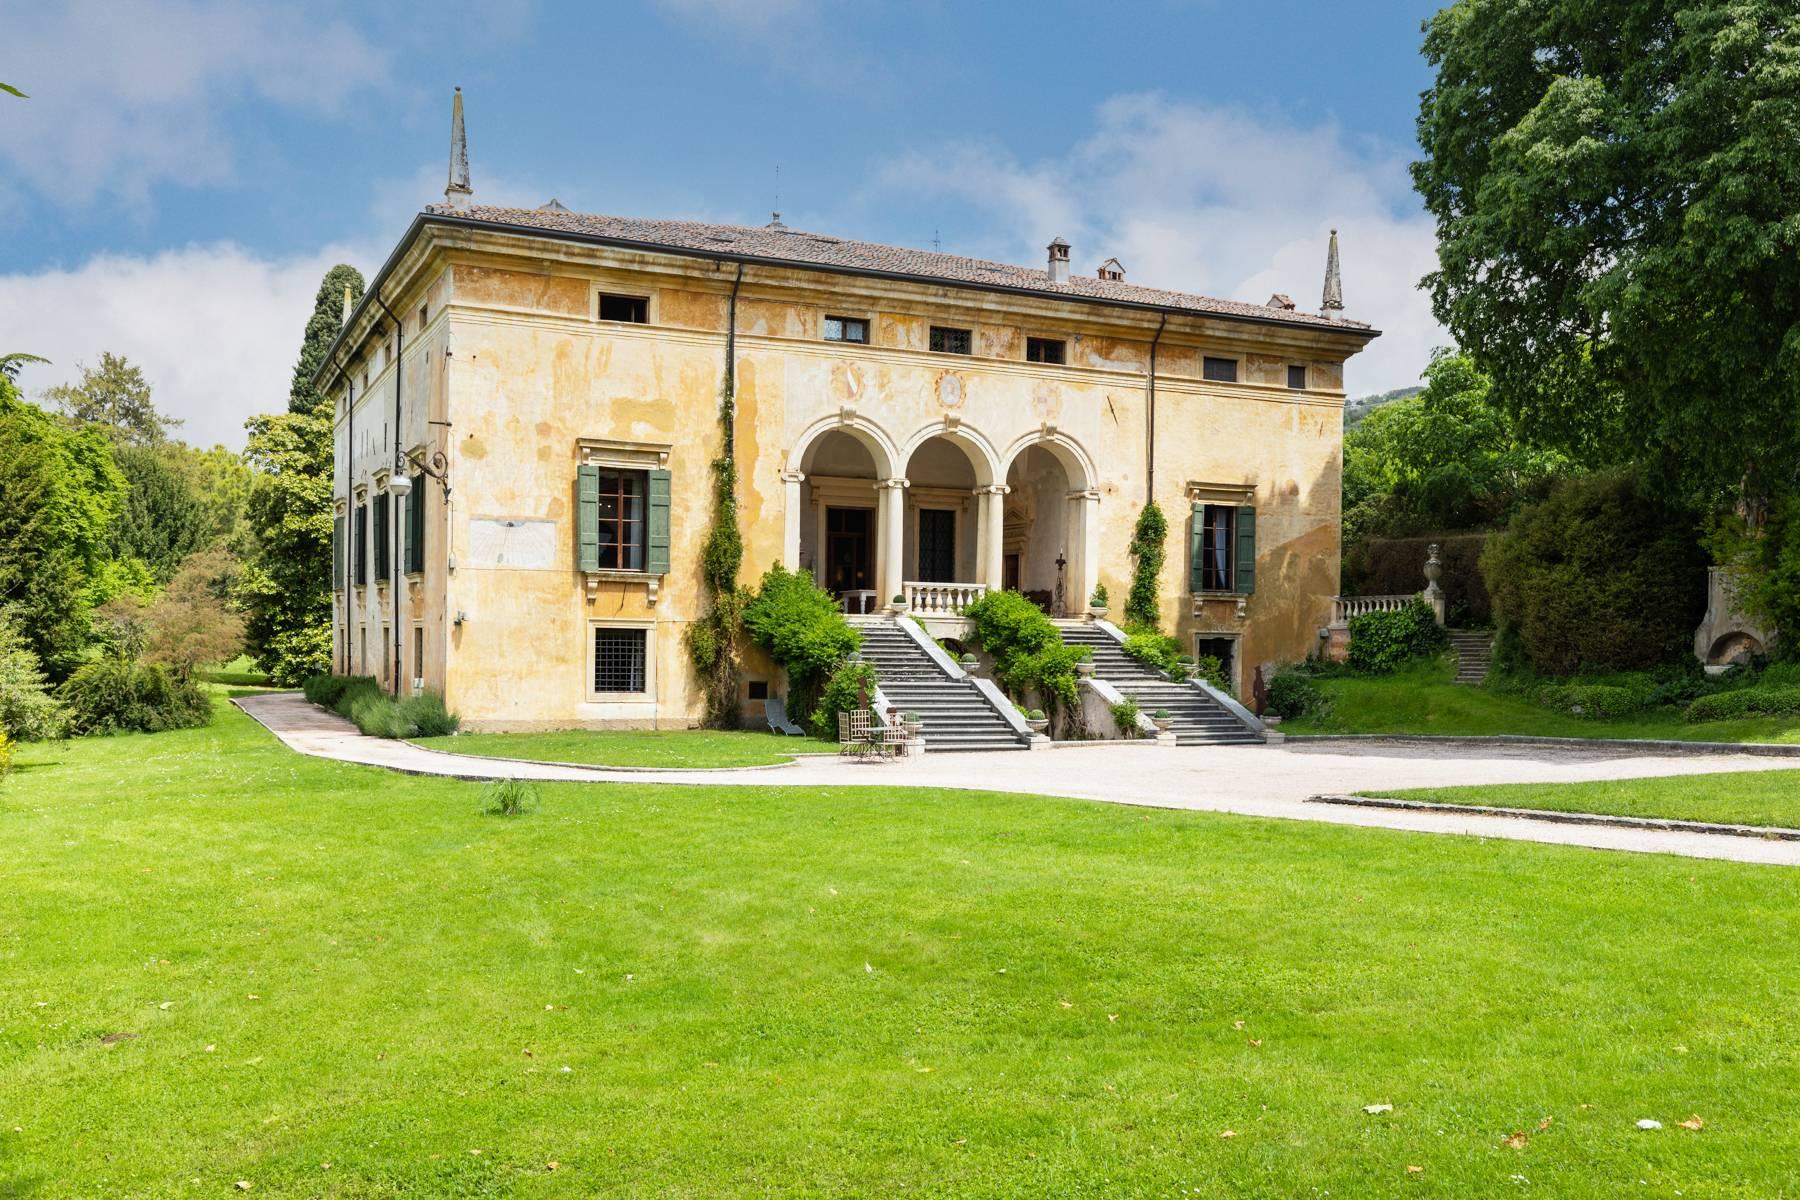 Villa in Vendita a Verona: 5 locali, 2400 mq - Foto 5